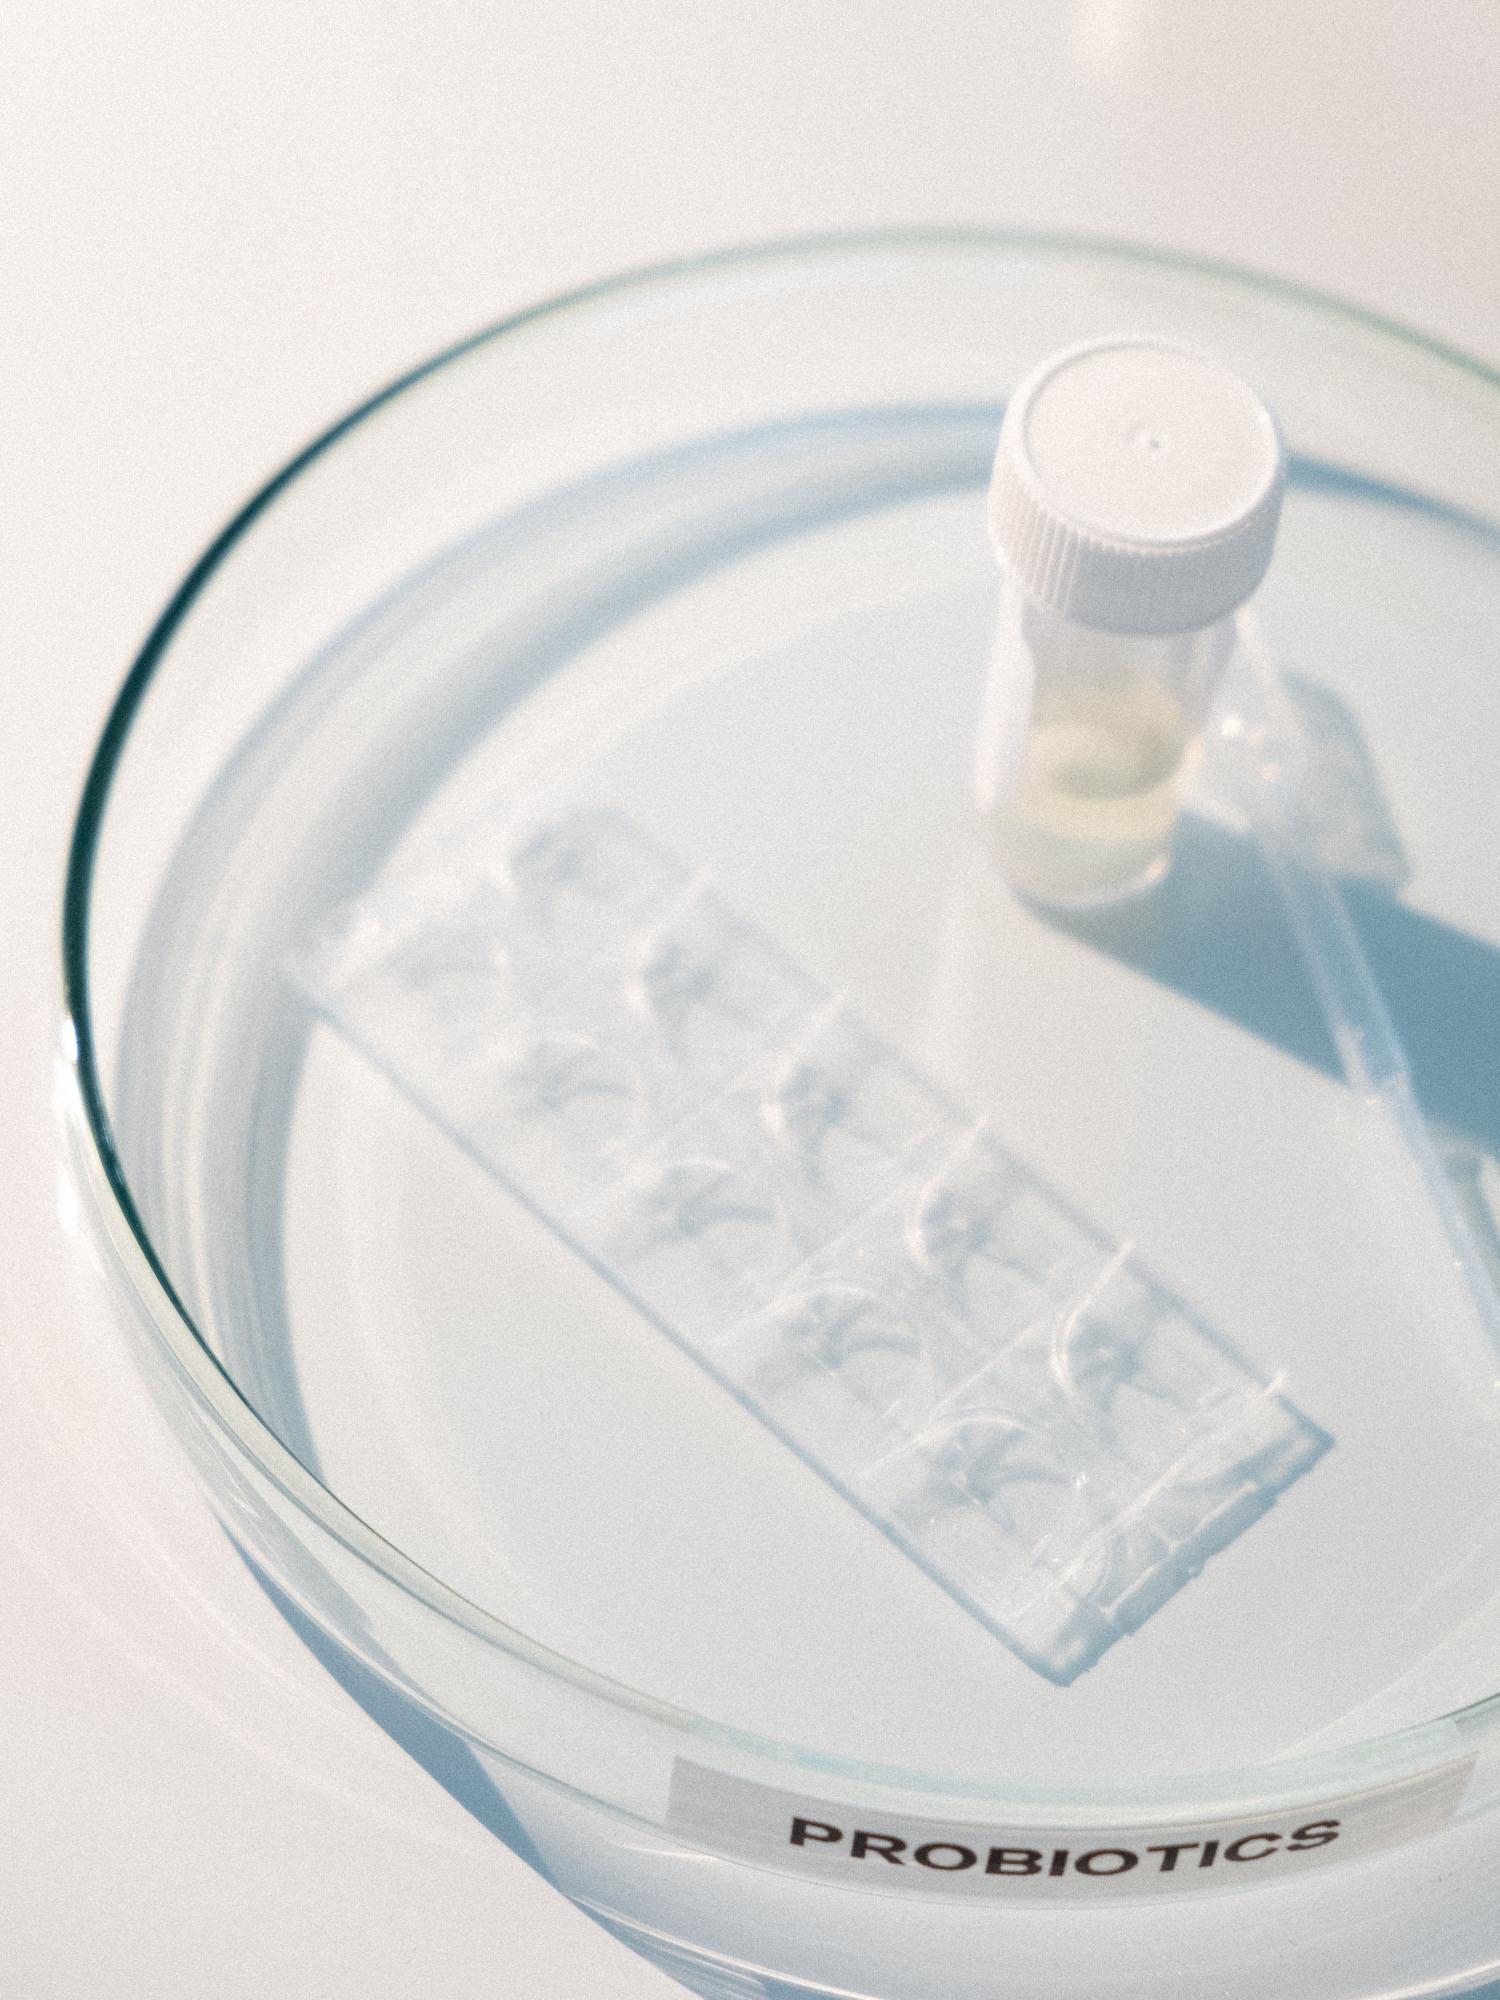 Beautyblog Lancome Labor Probiotika in Komsetik